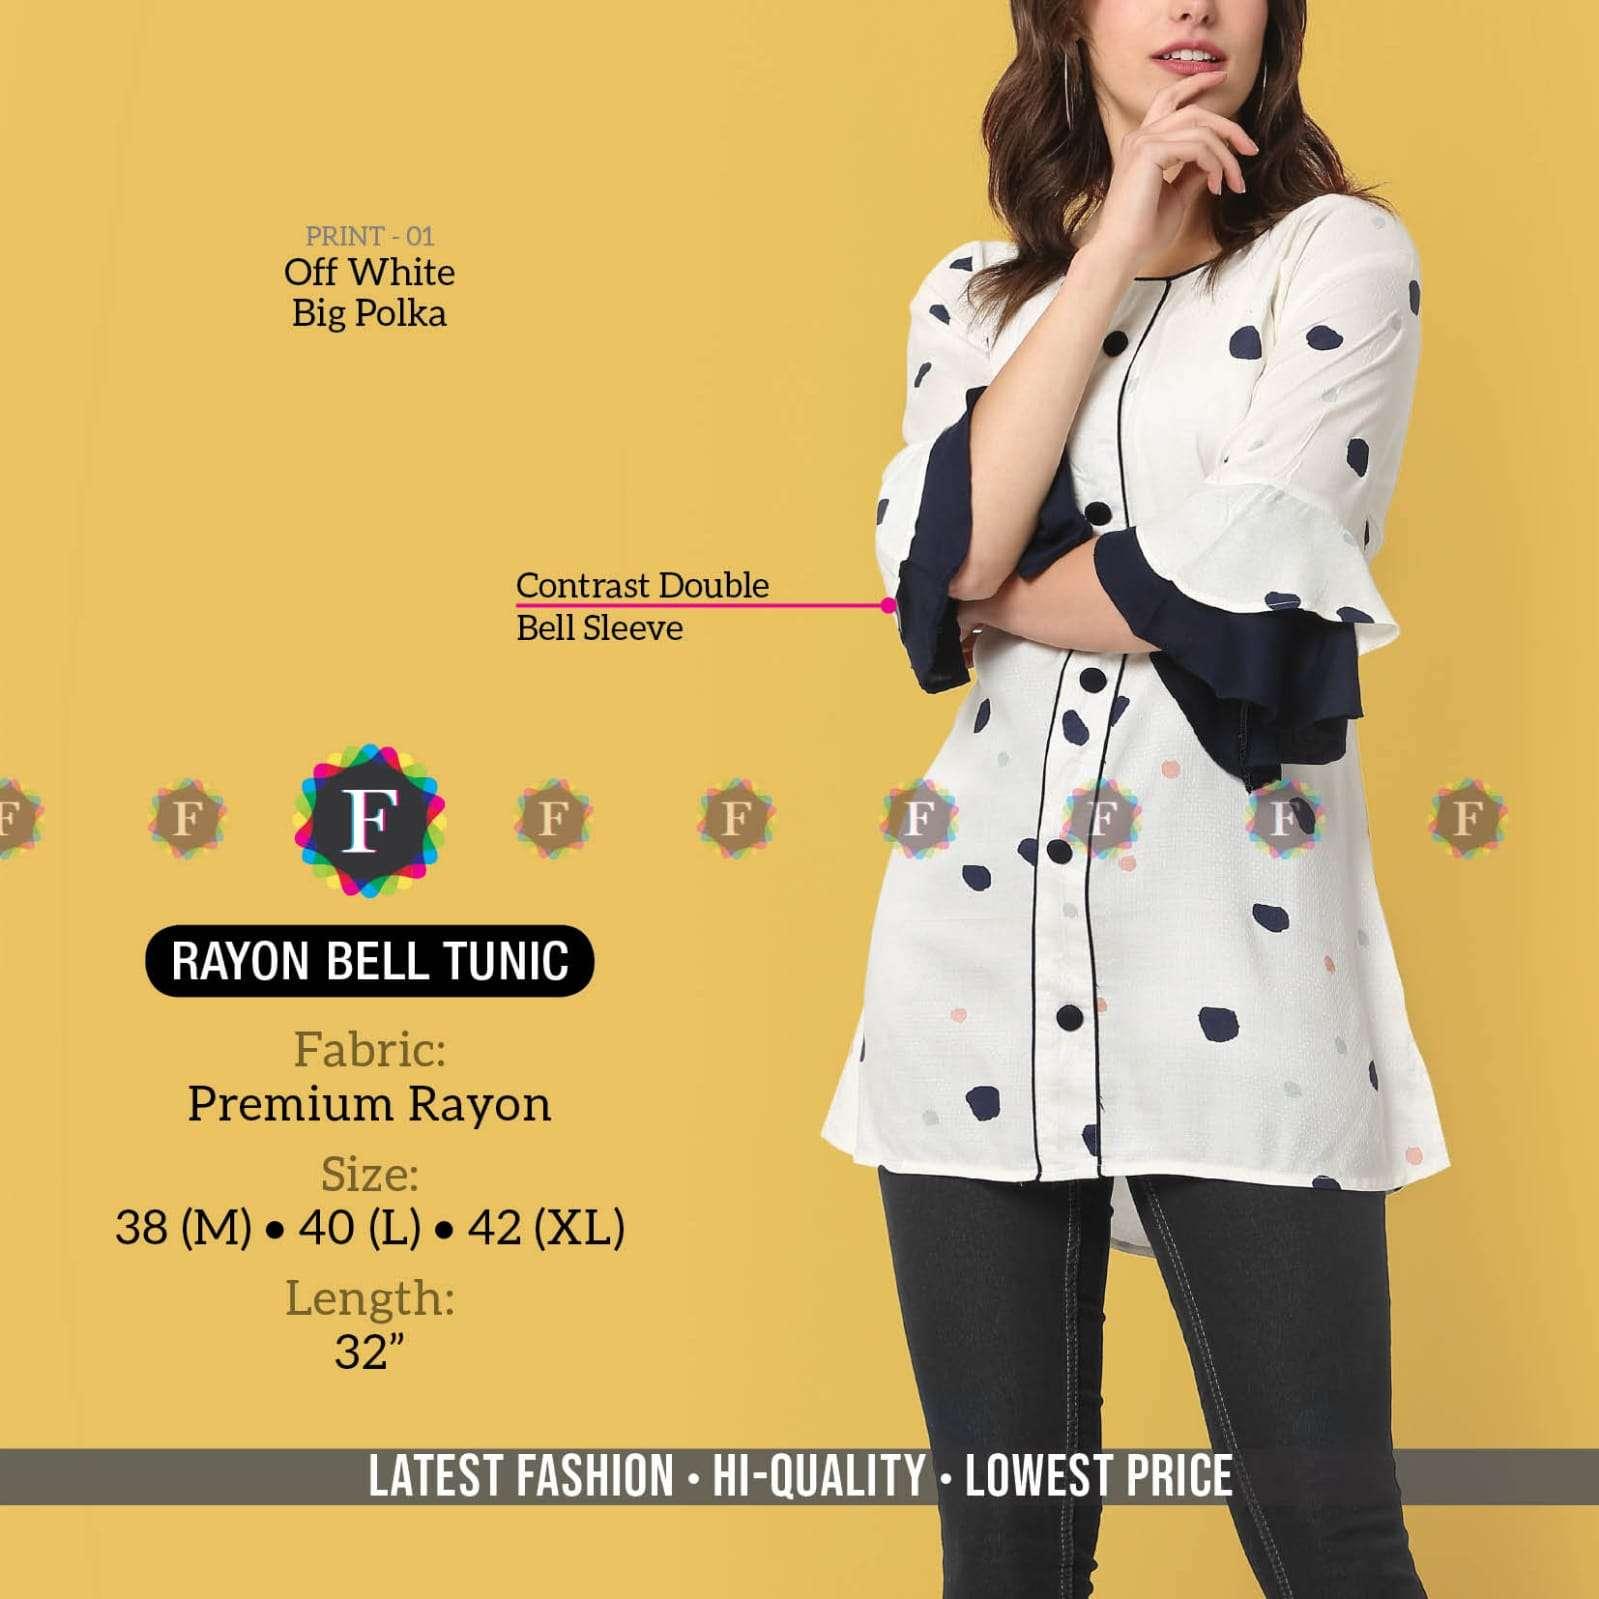 K4u Present Rayon Bell Tunic Western Wear Collection